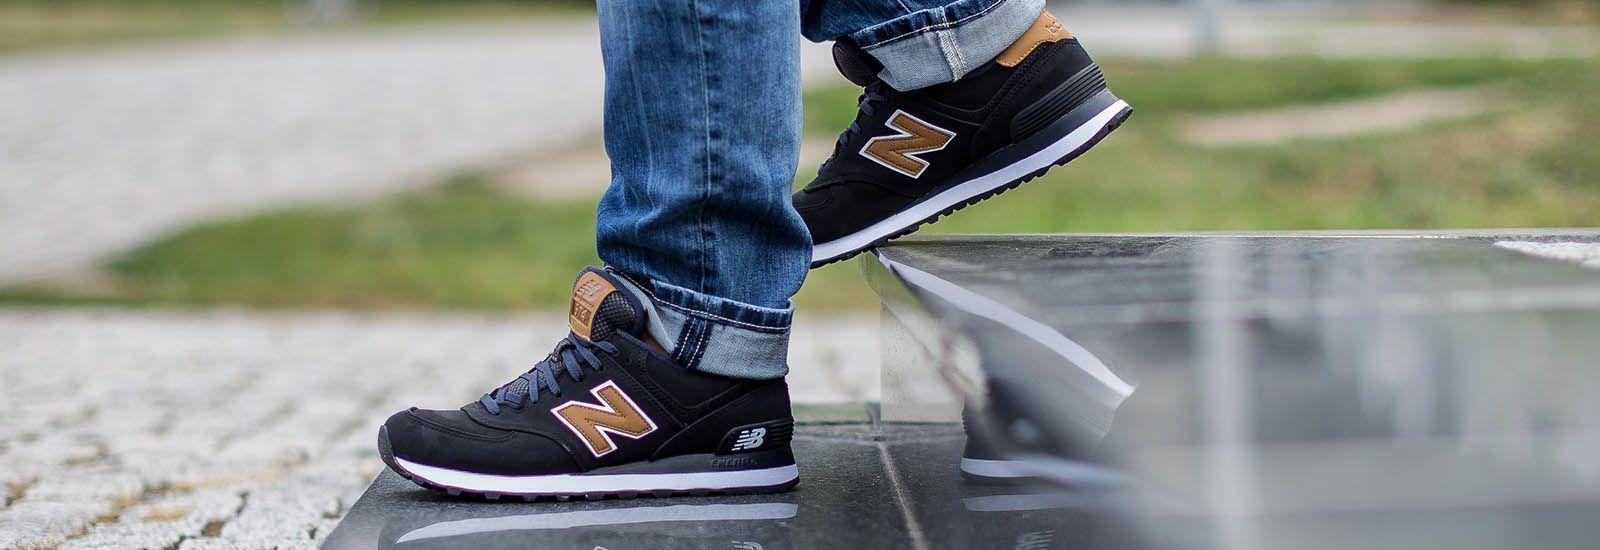 Buty New Balance Ml574sla New Balance New Balance Sneaker Shoes